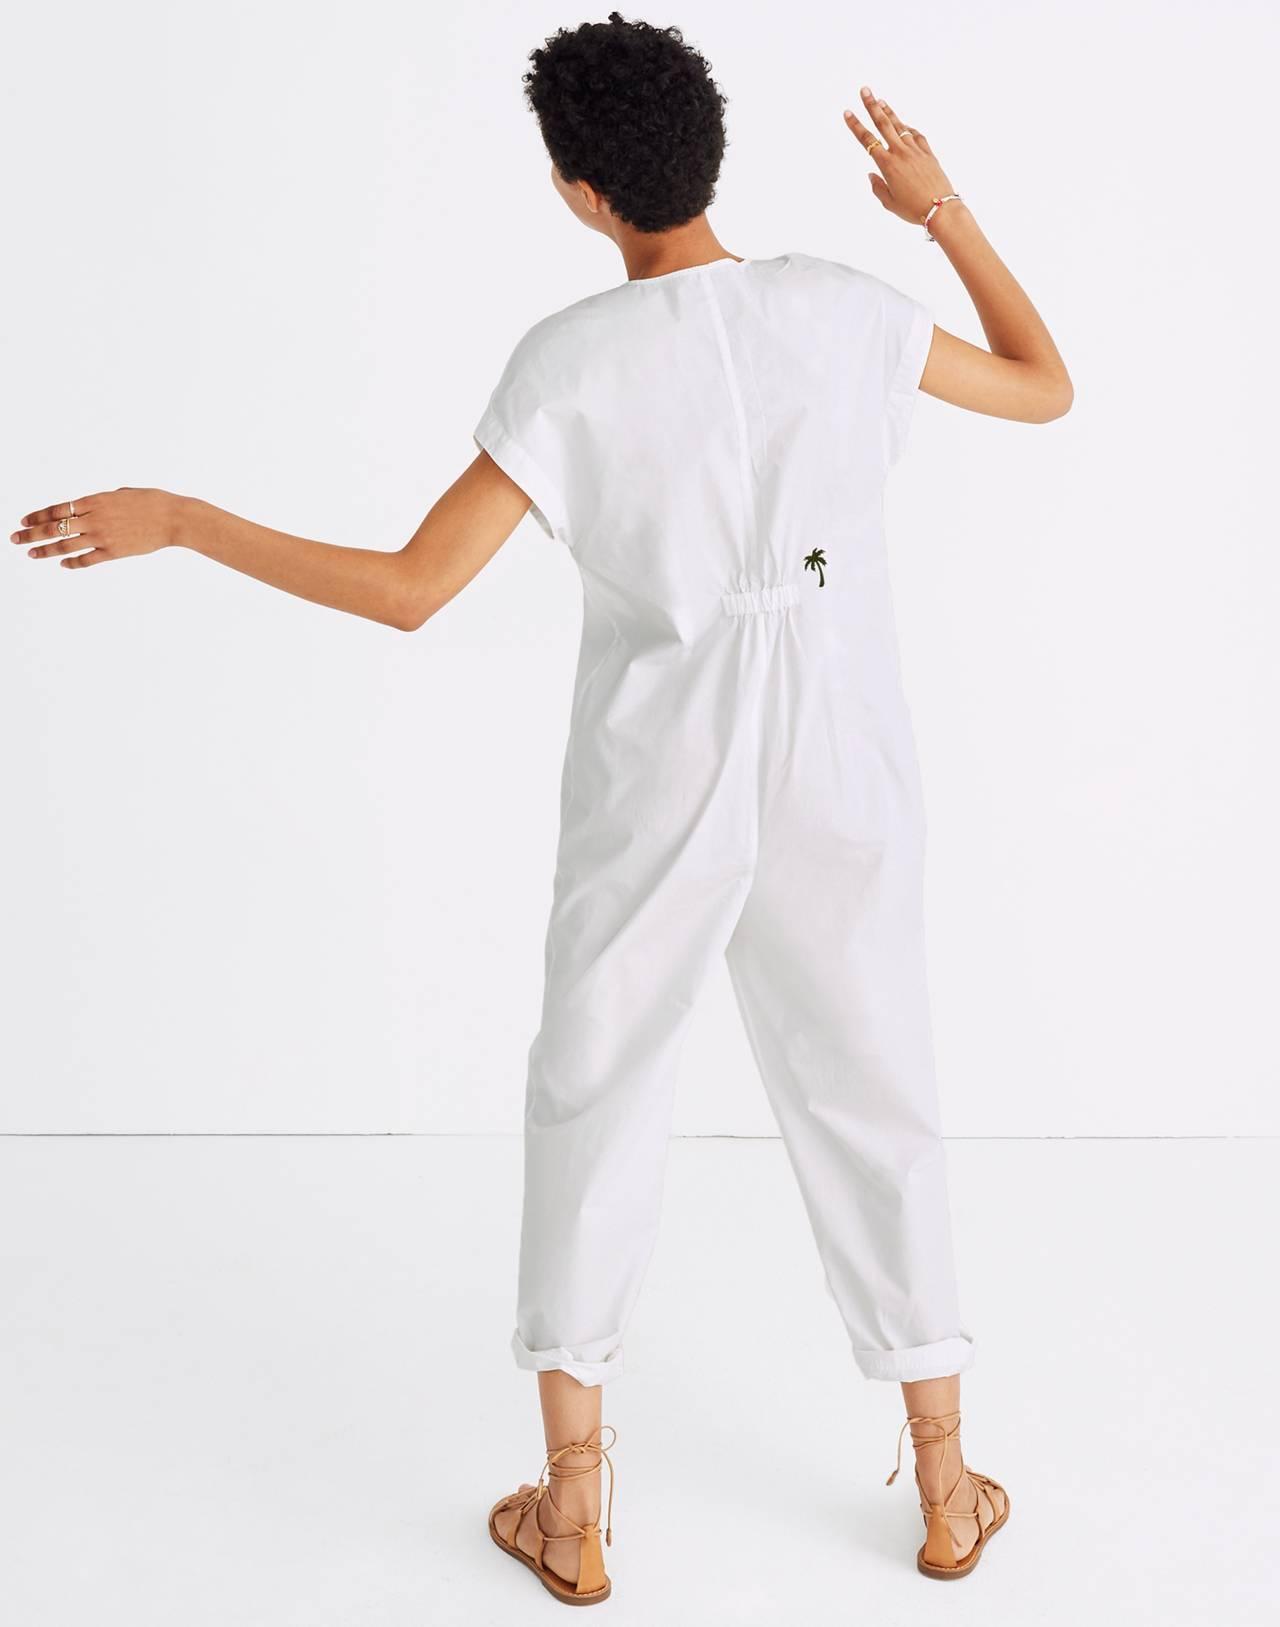 Mosswood Jumpsuit in eyelet white image 3